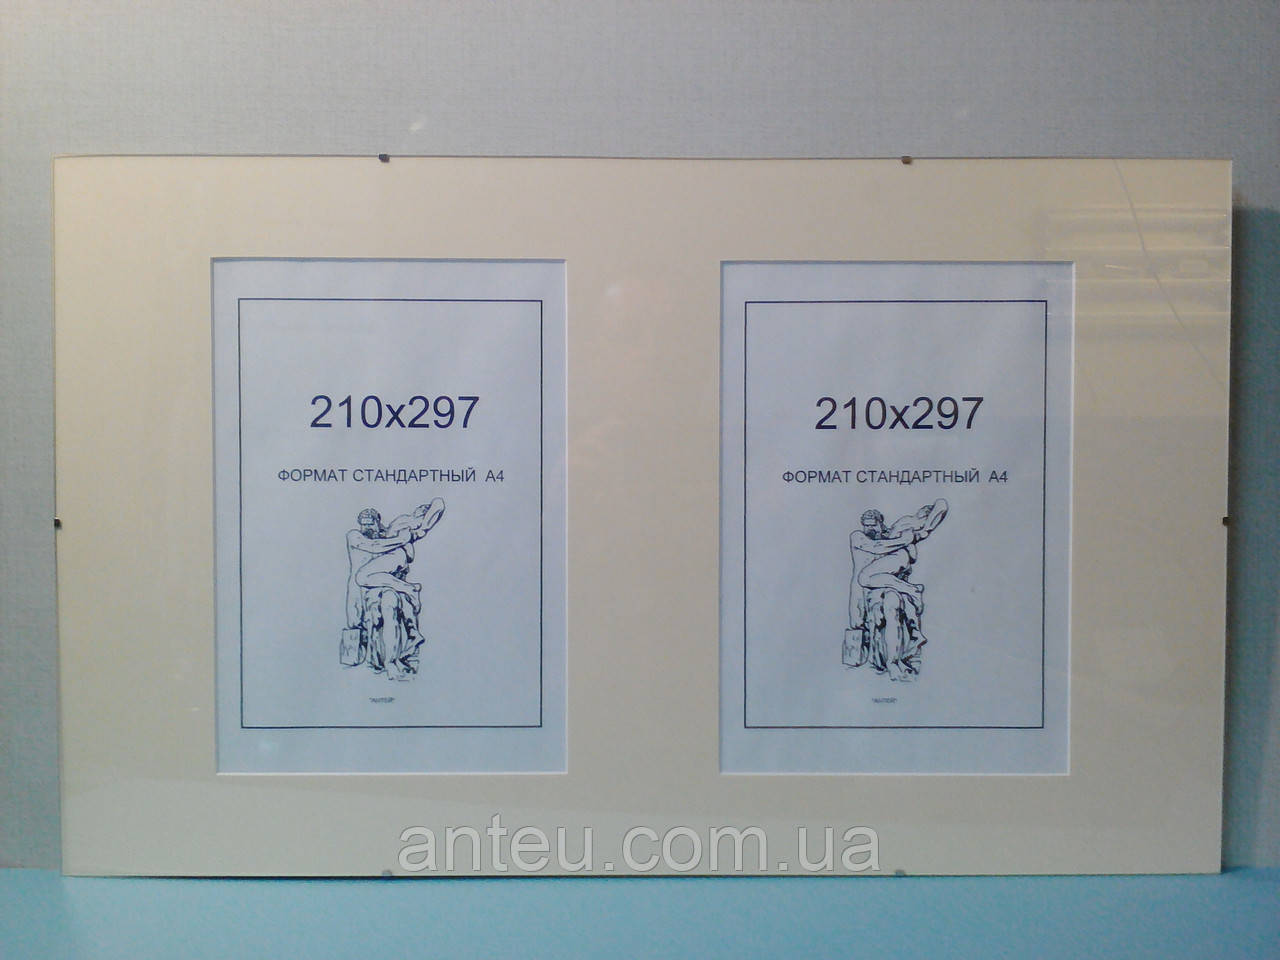 Антирама 670х410 з паспарту на 2 вікна 210х297.